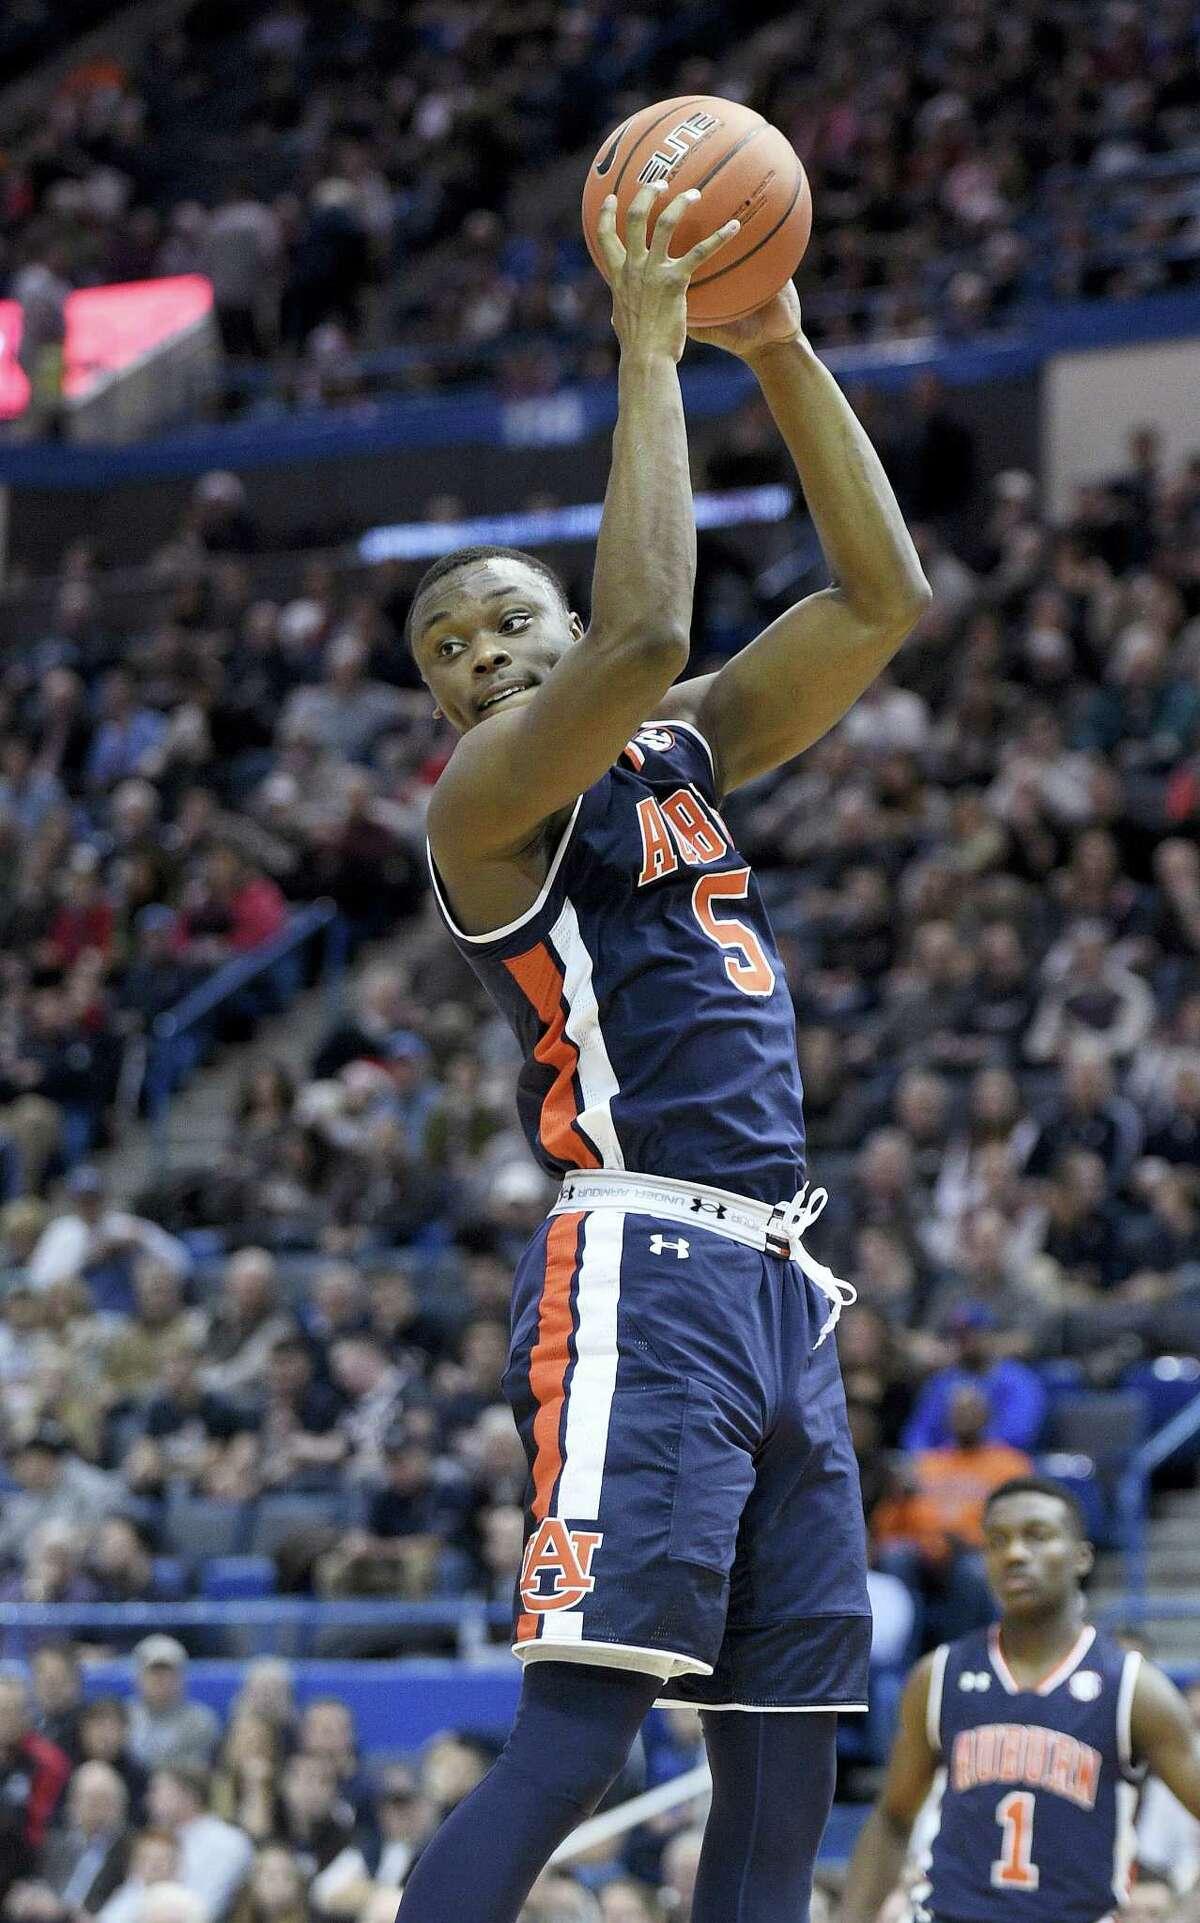 Auburn's Mustapha Heron grabs a rebound during Friday's game against UConn in Hartford.